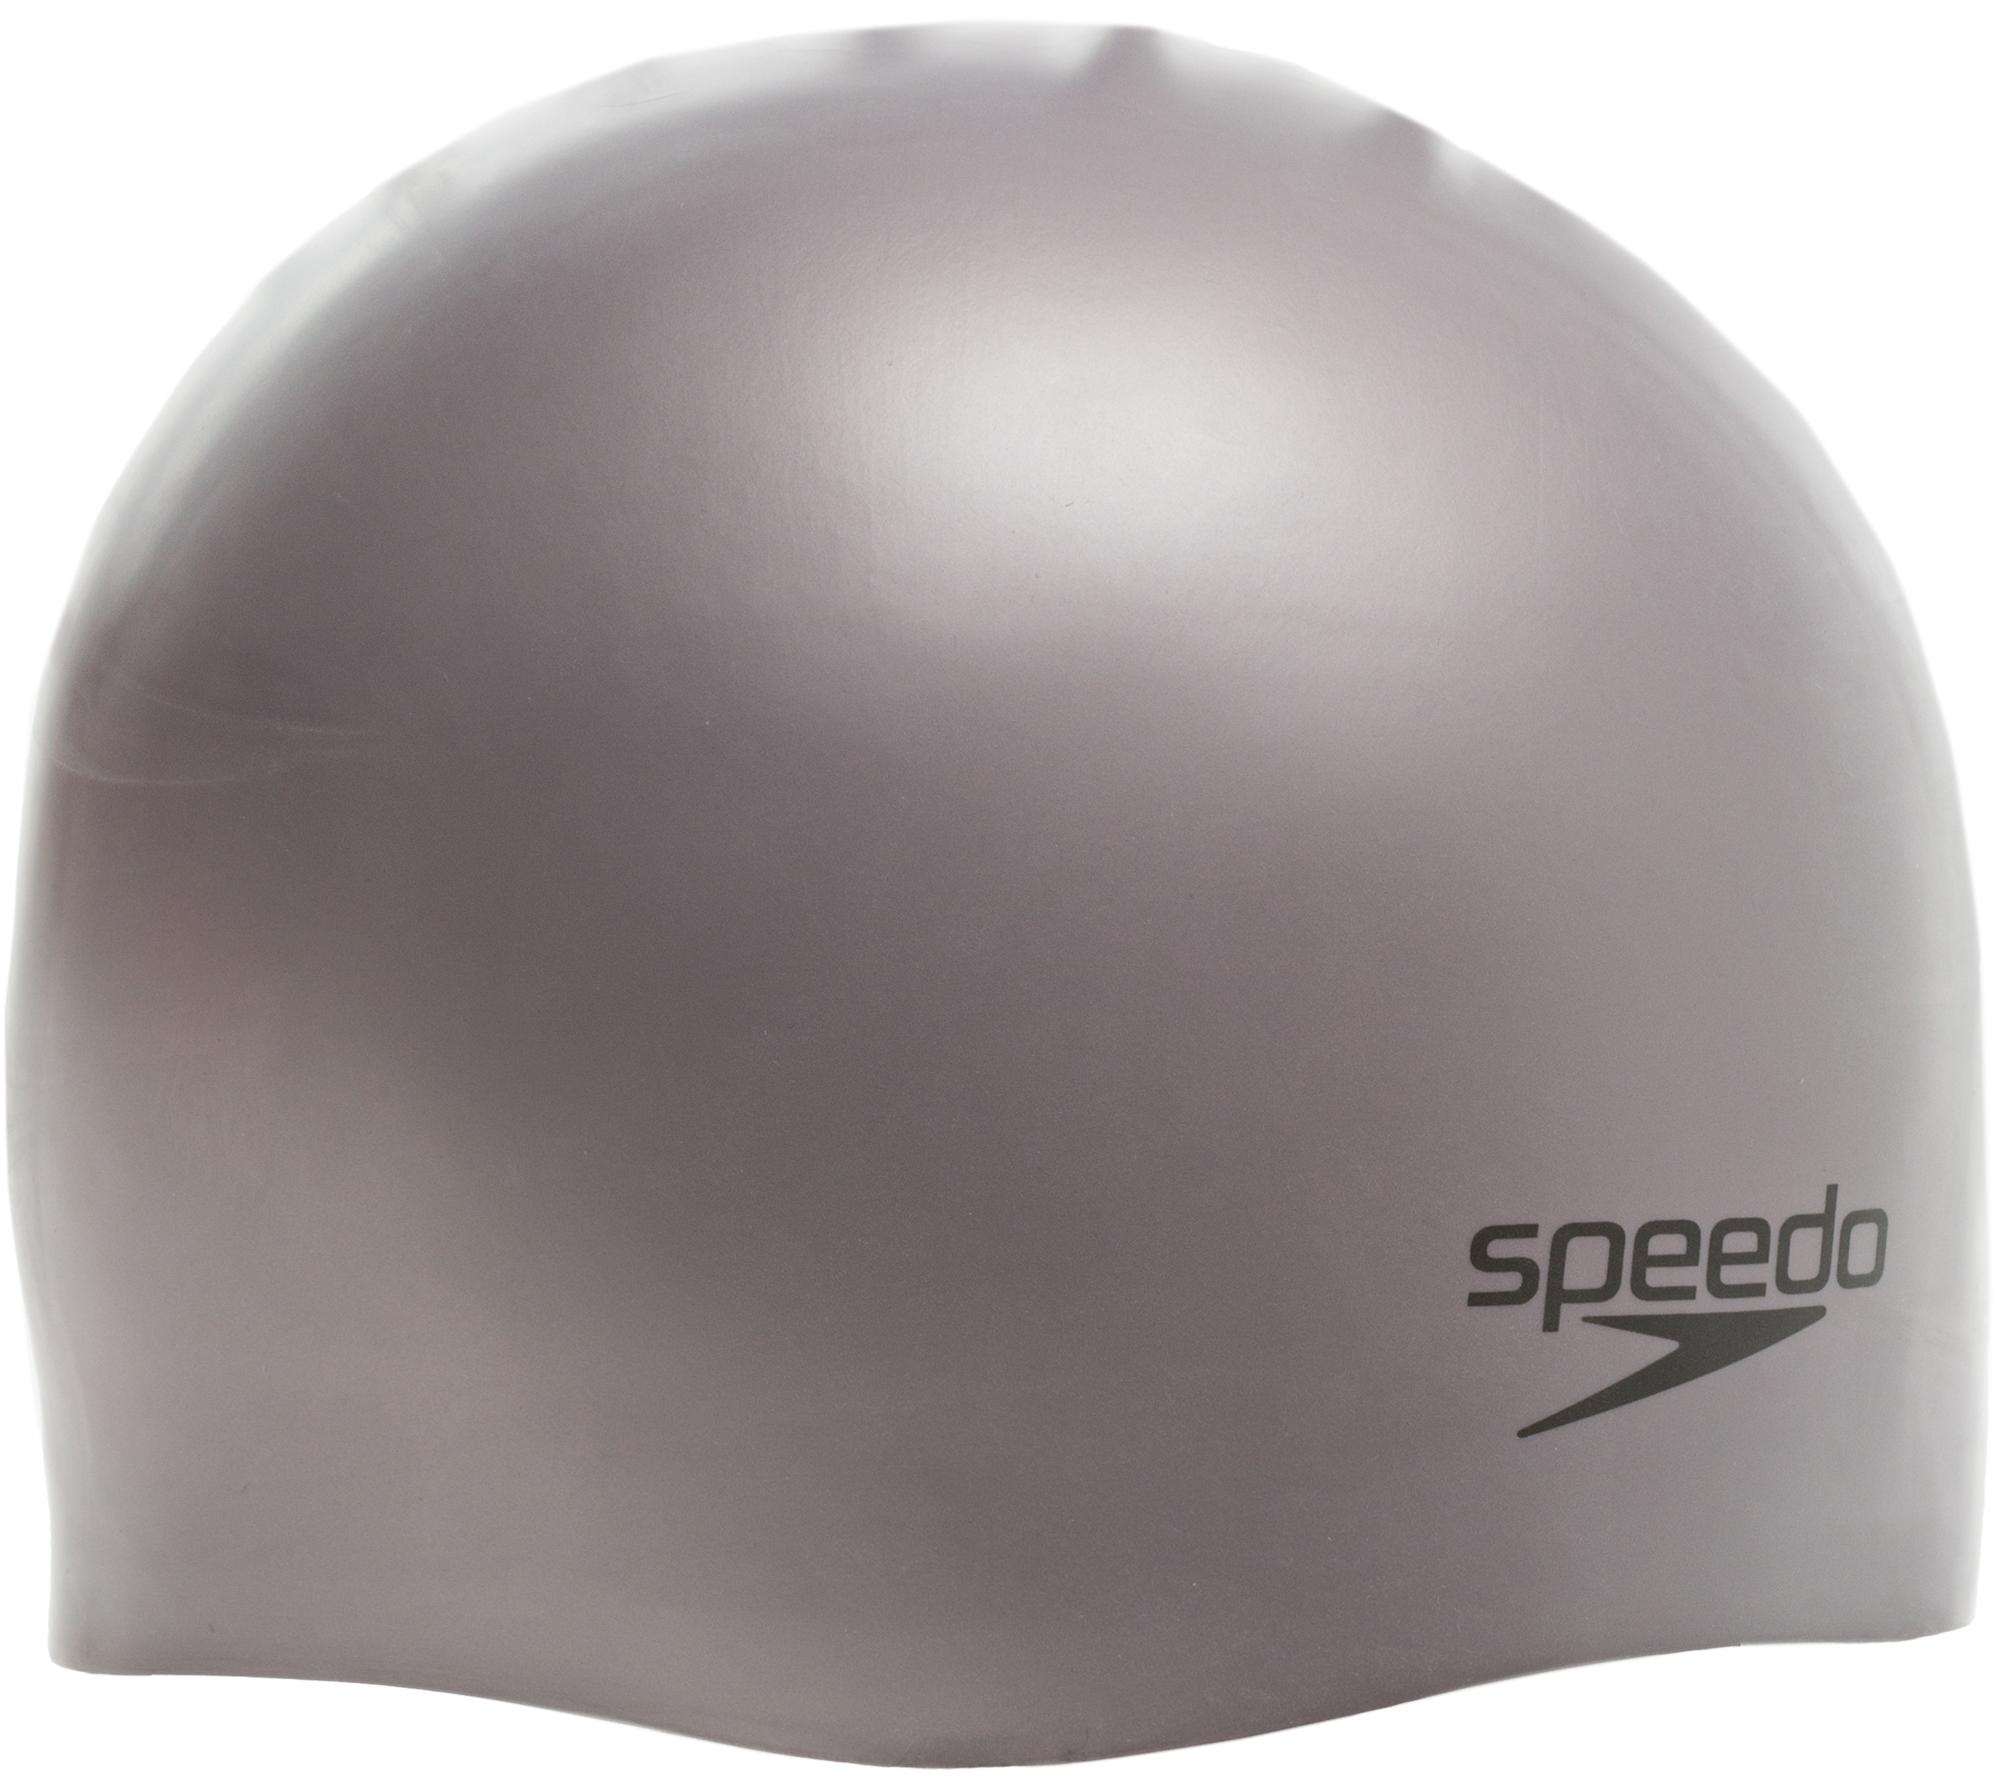 Speedo Шапочка для плавания Speedo